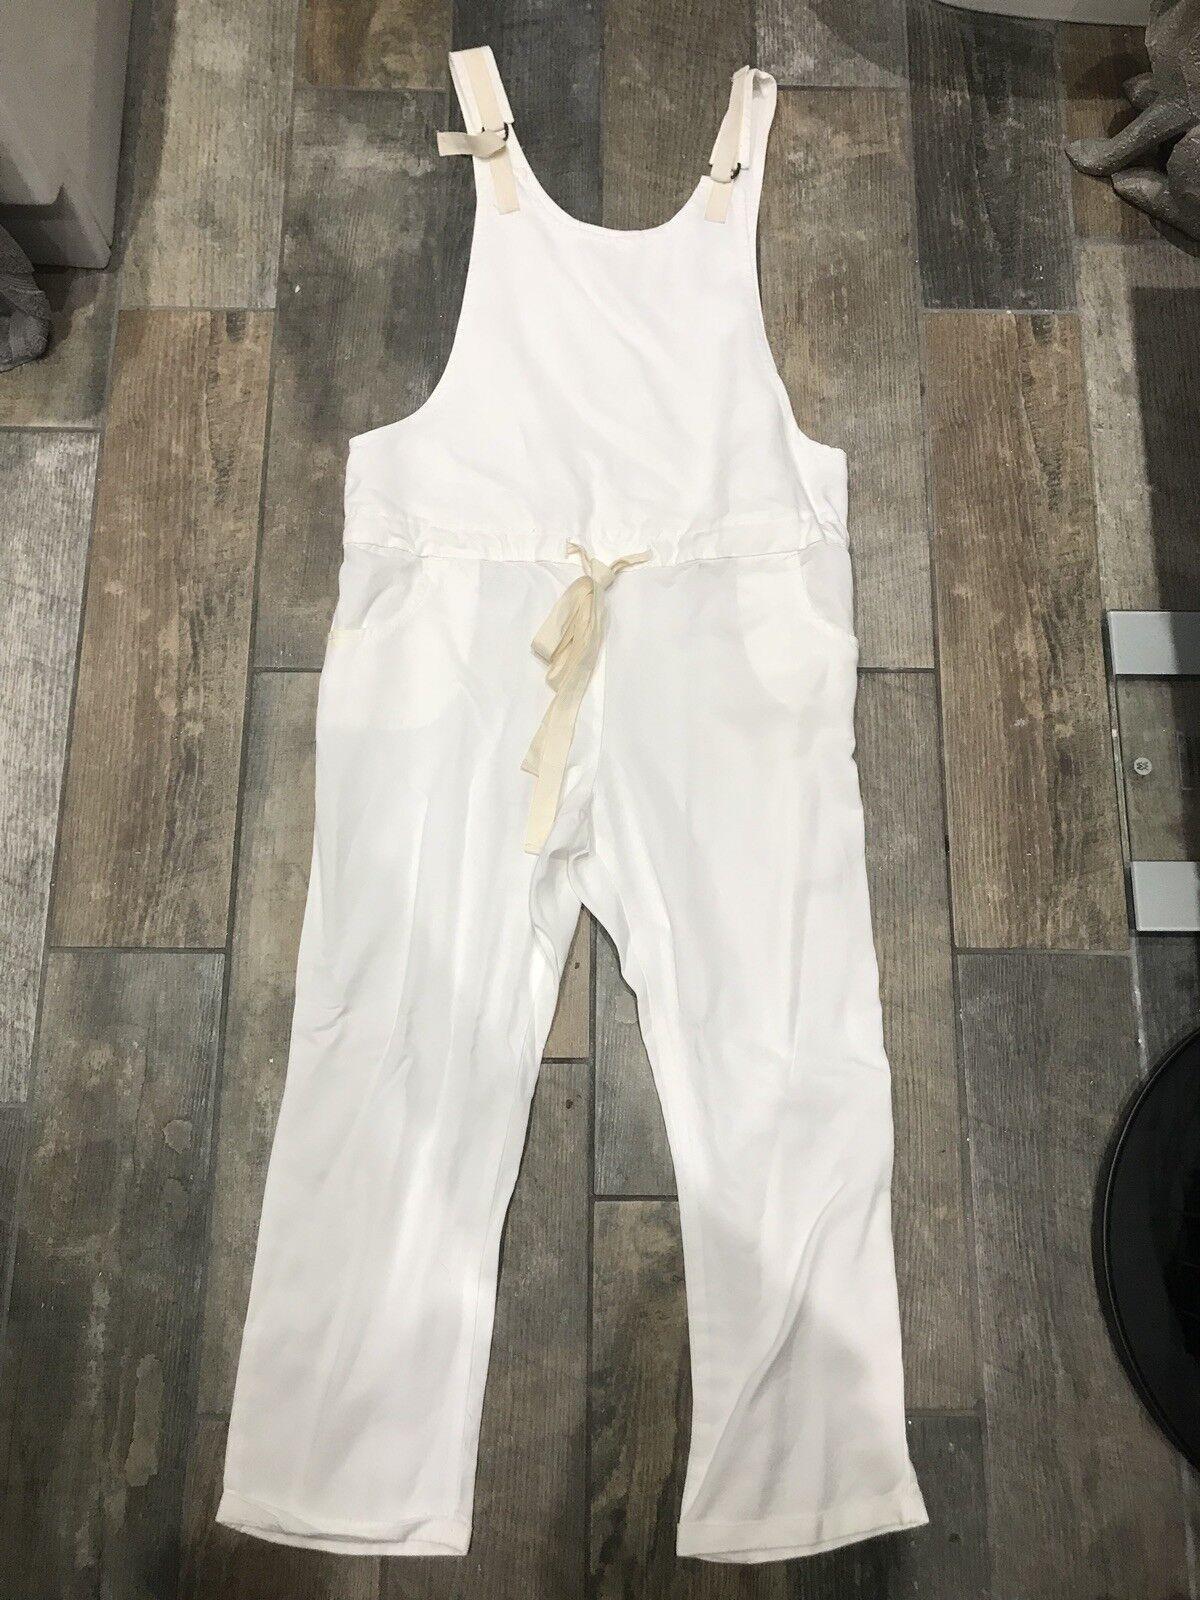 Mango White & Natural Waist Tie Jump Suit Size M New